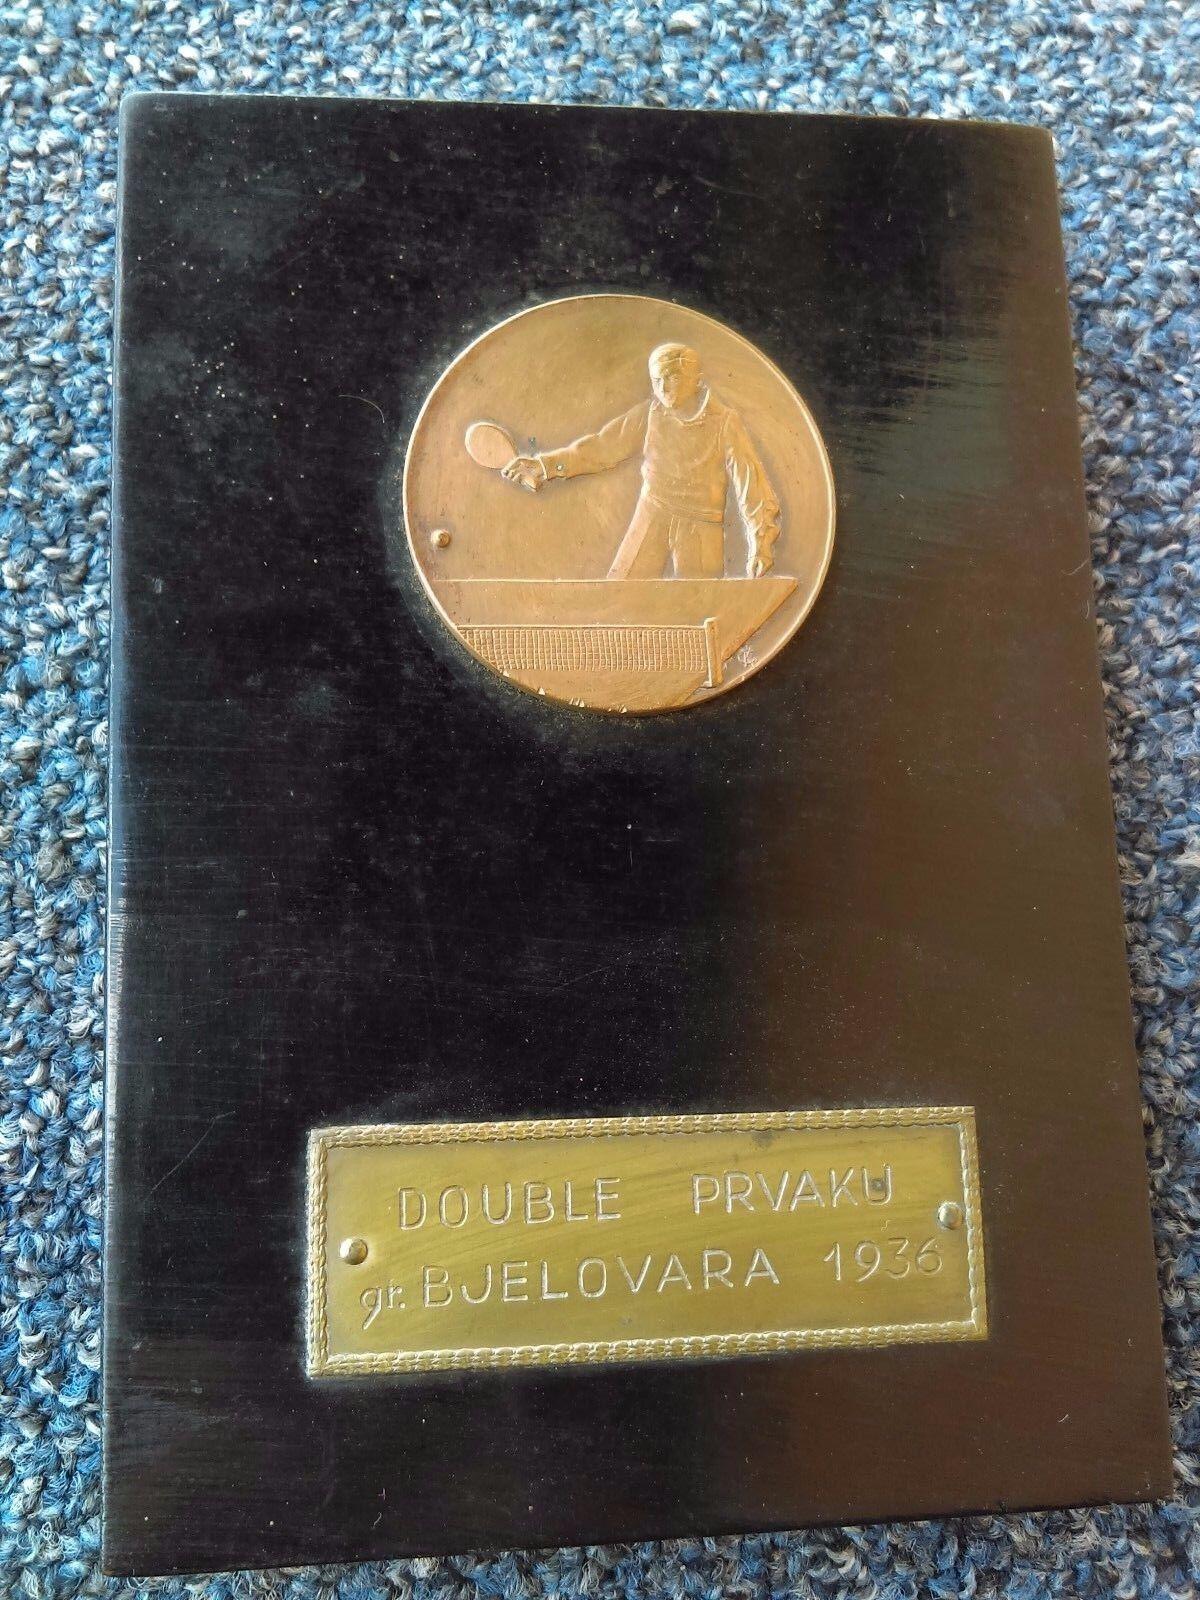 Table tennis 1936, Kingdom of Yugoslavia Croatia Bjelovar, vintage medal plaque